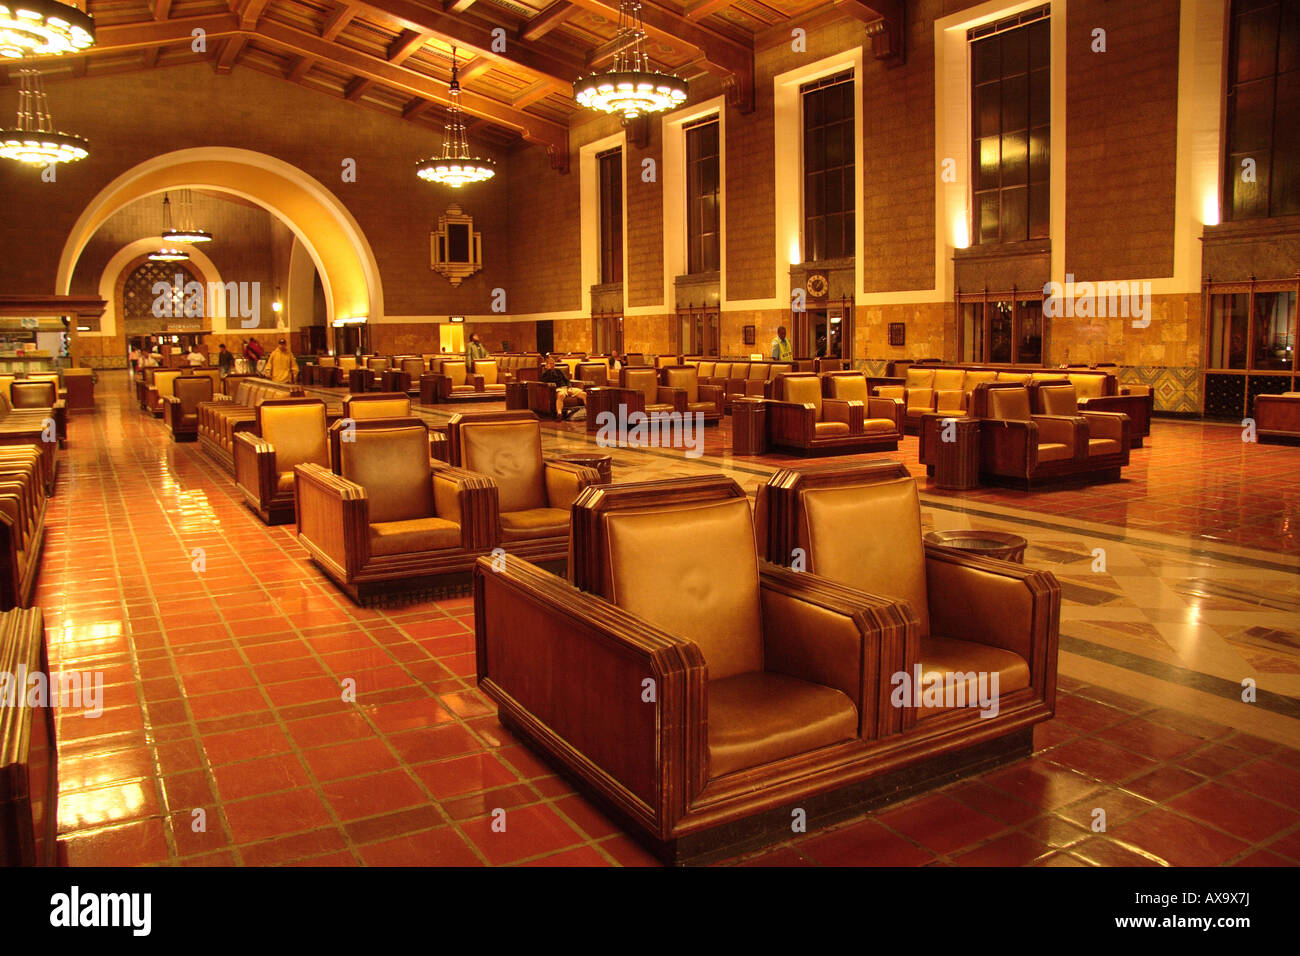 Interior Los Angeles Union Station Lobby 1940's decor Immagini Stock